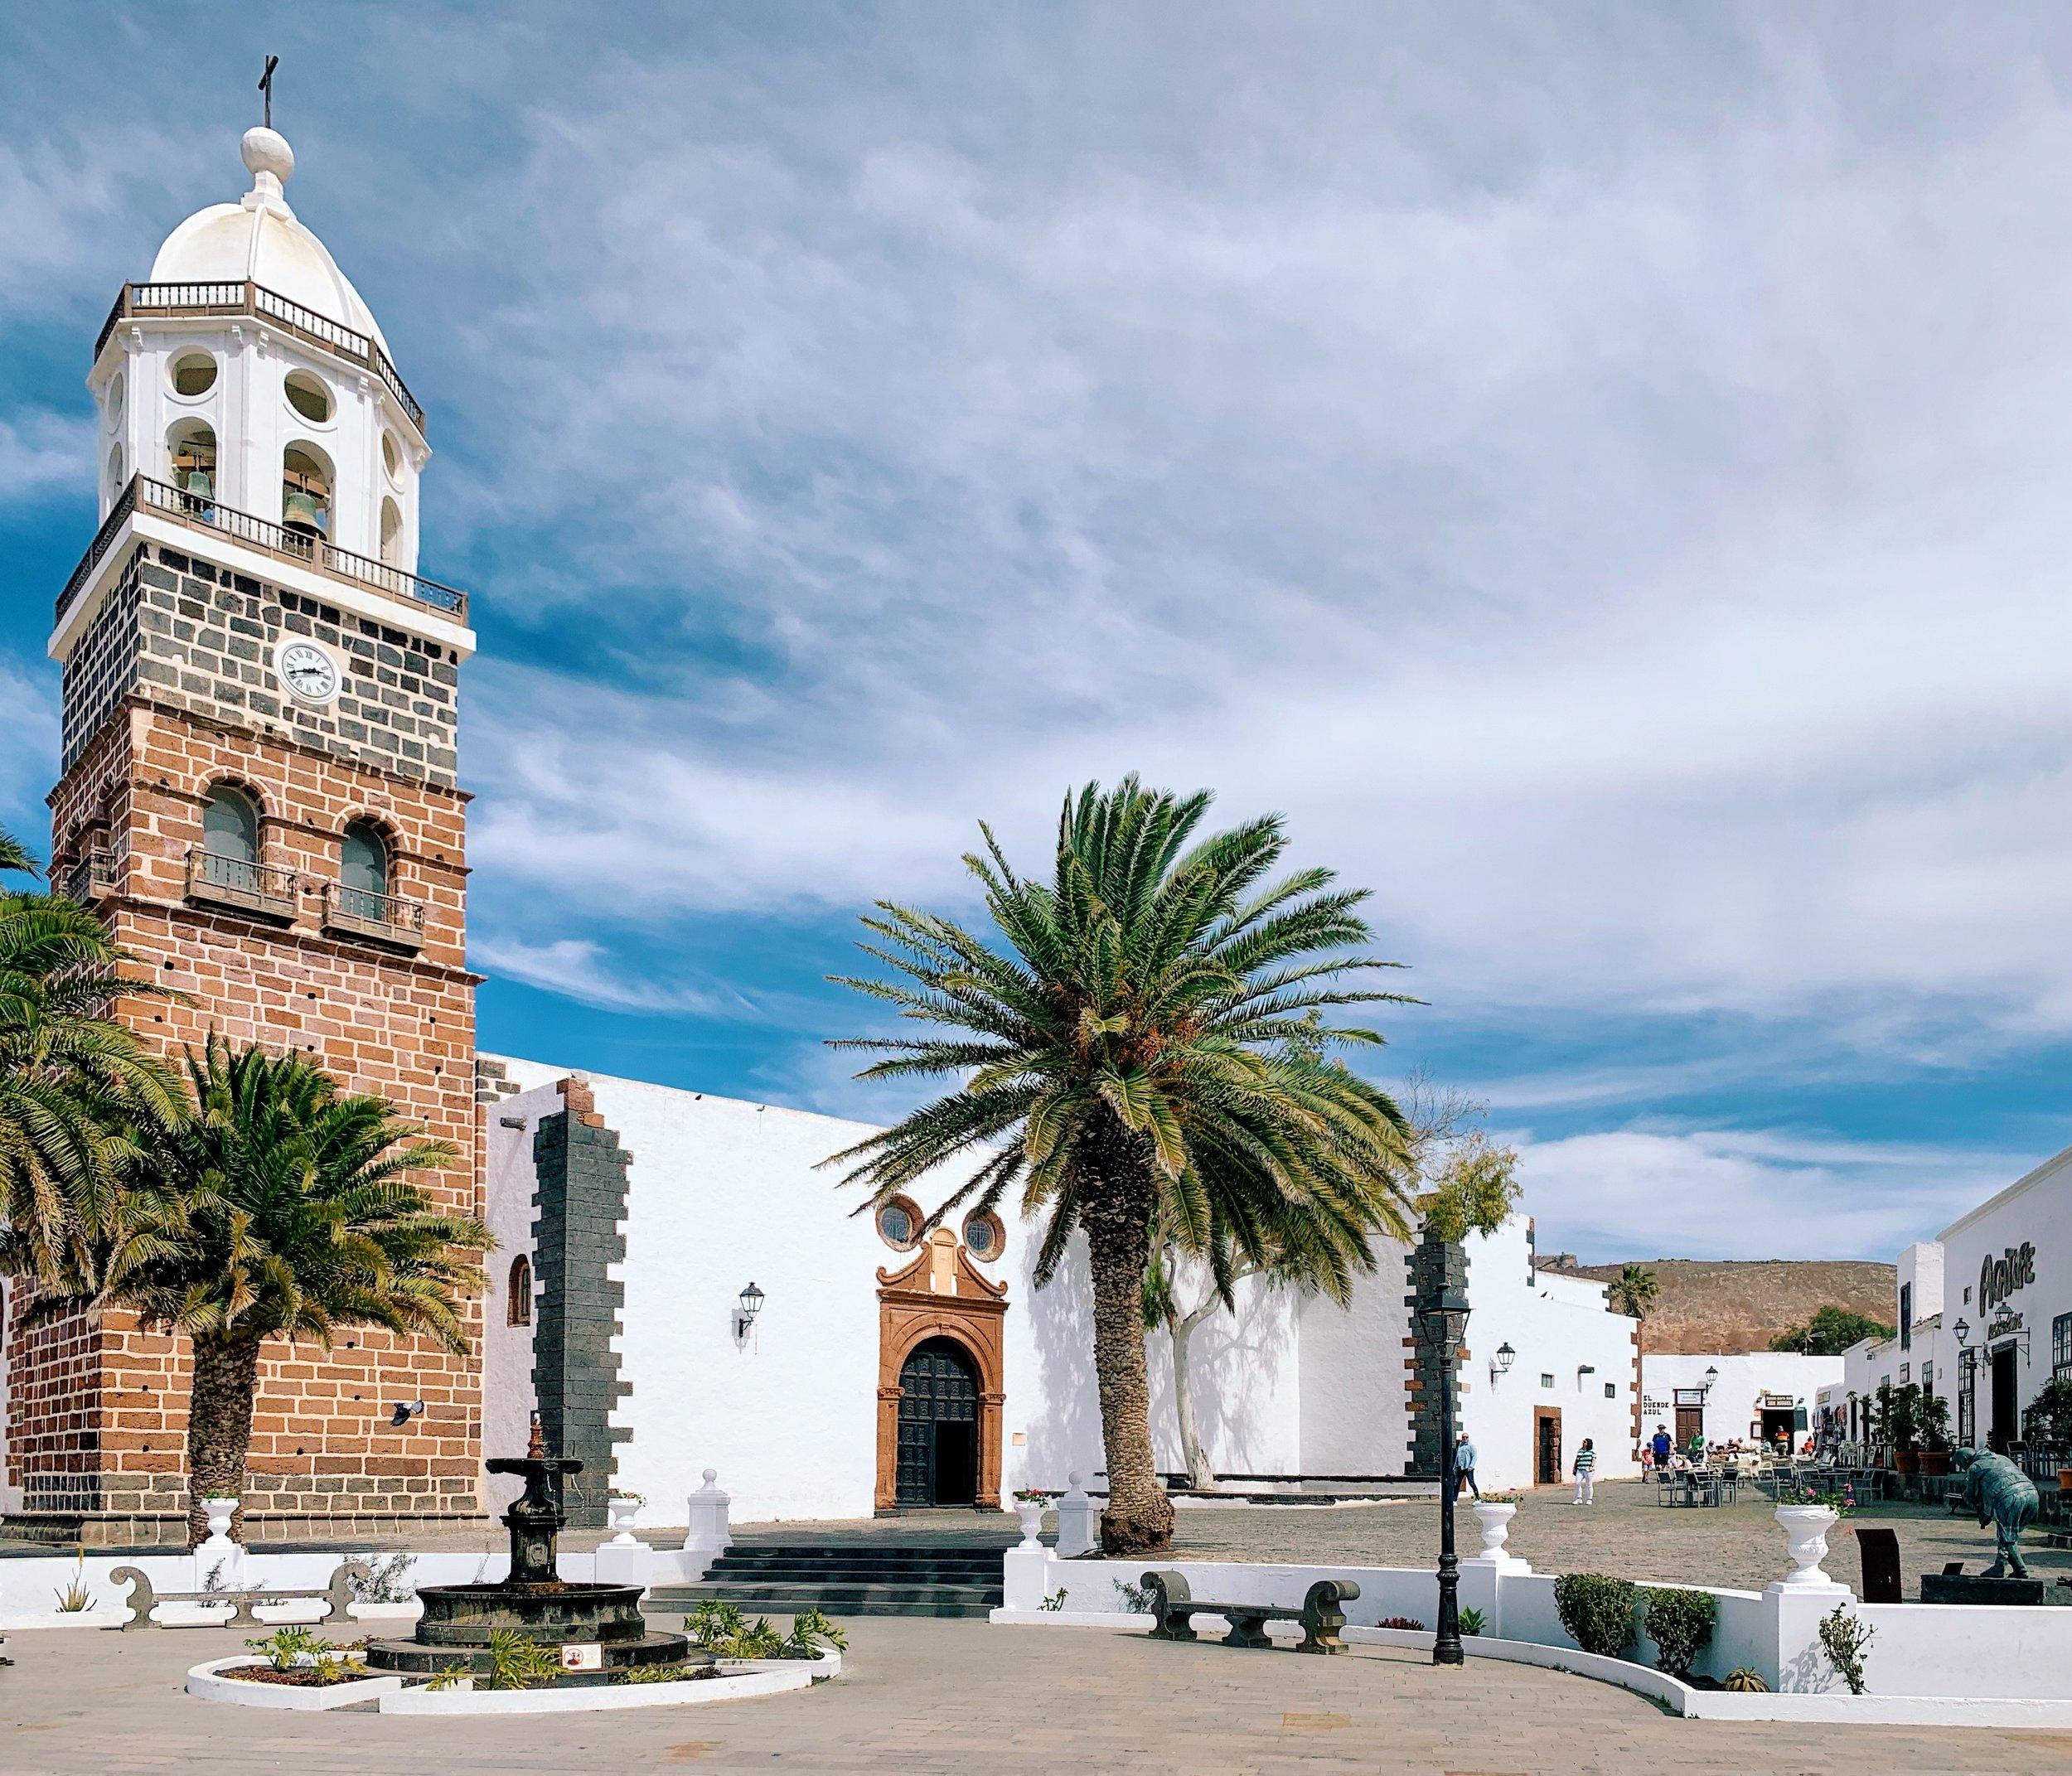 Plaza de la Constitución, Teguise